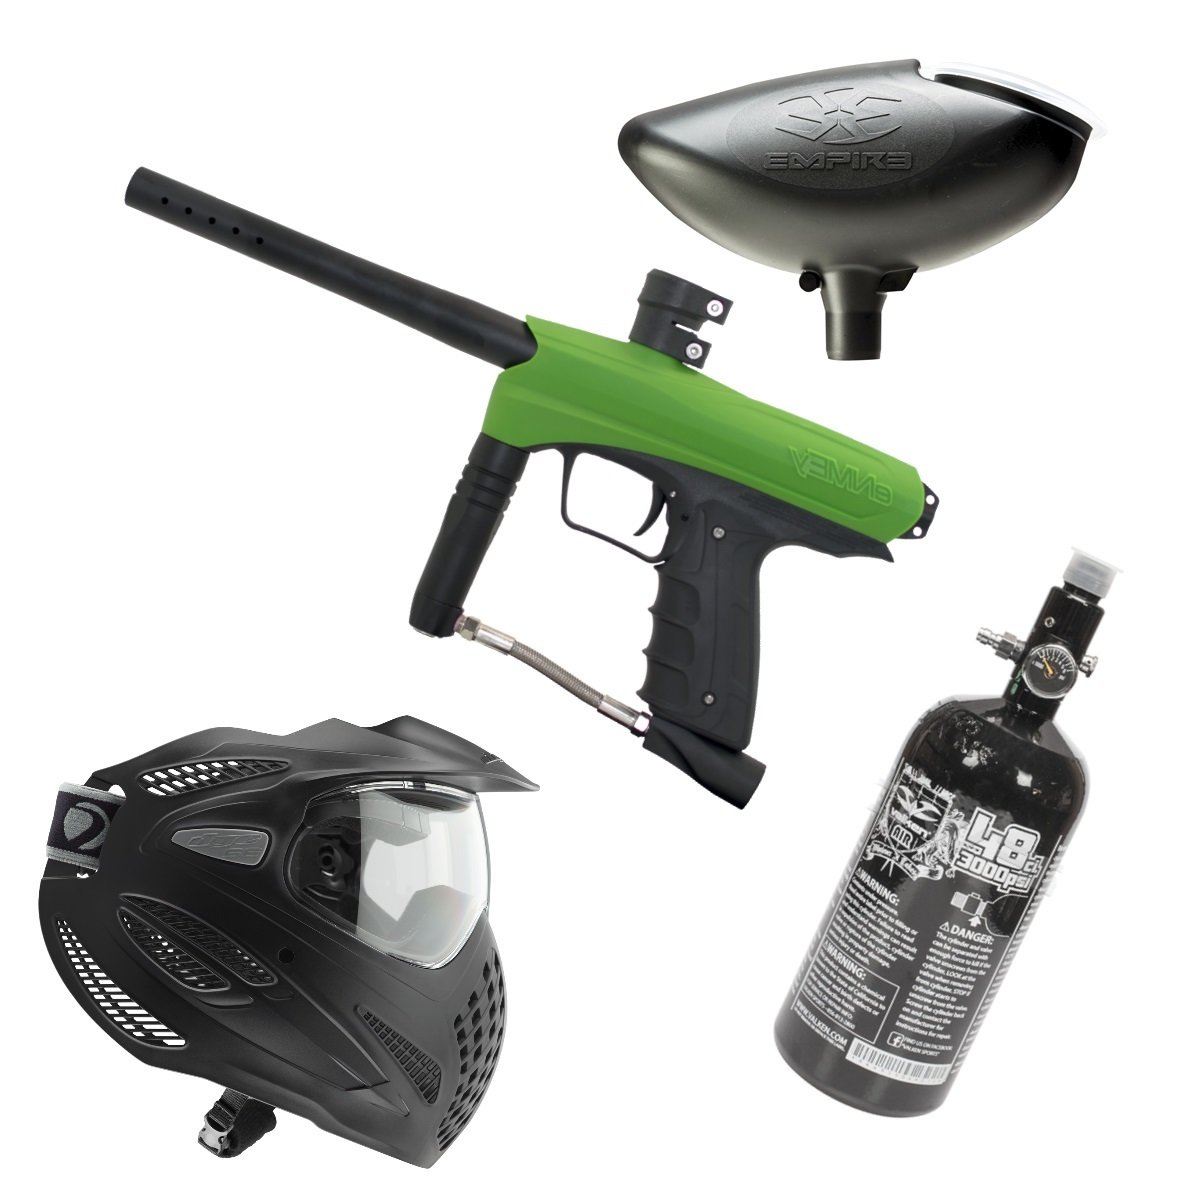 Marker Package - Gog Enmey Marker - Green / Empire 200 rd Loader / Dye Se Goggle Single / Valken 48cu 3000 psi Air Tank